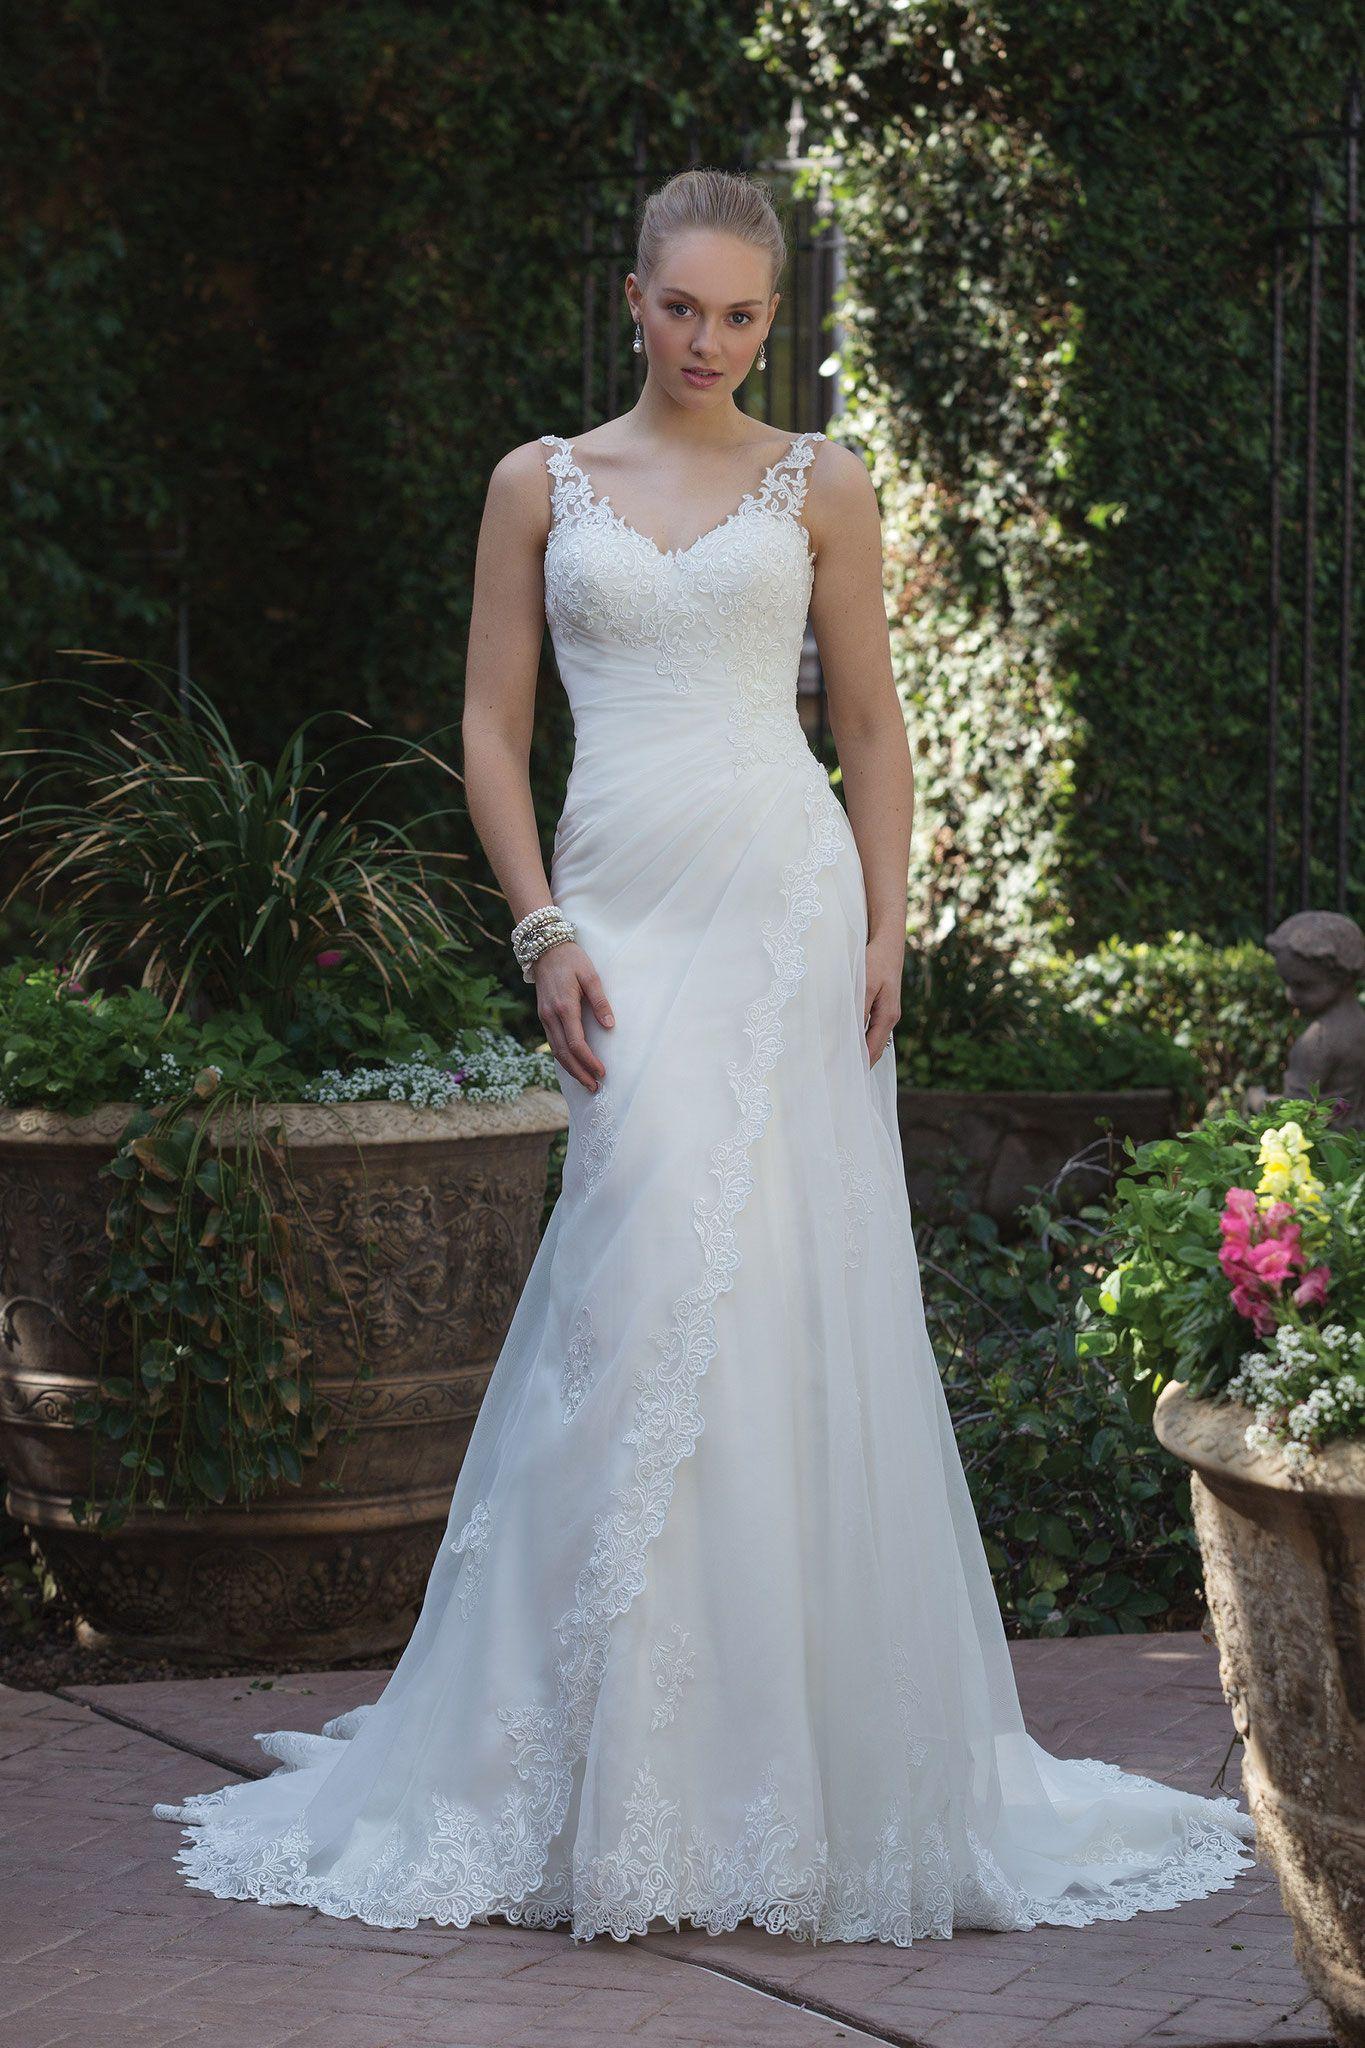 Red wedding dress meaning  Kollektion Sincerity  brautmodentirol tirolerbraut sincerity